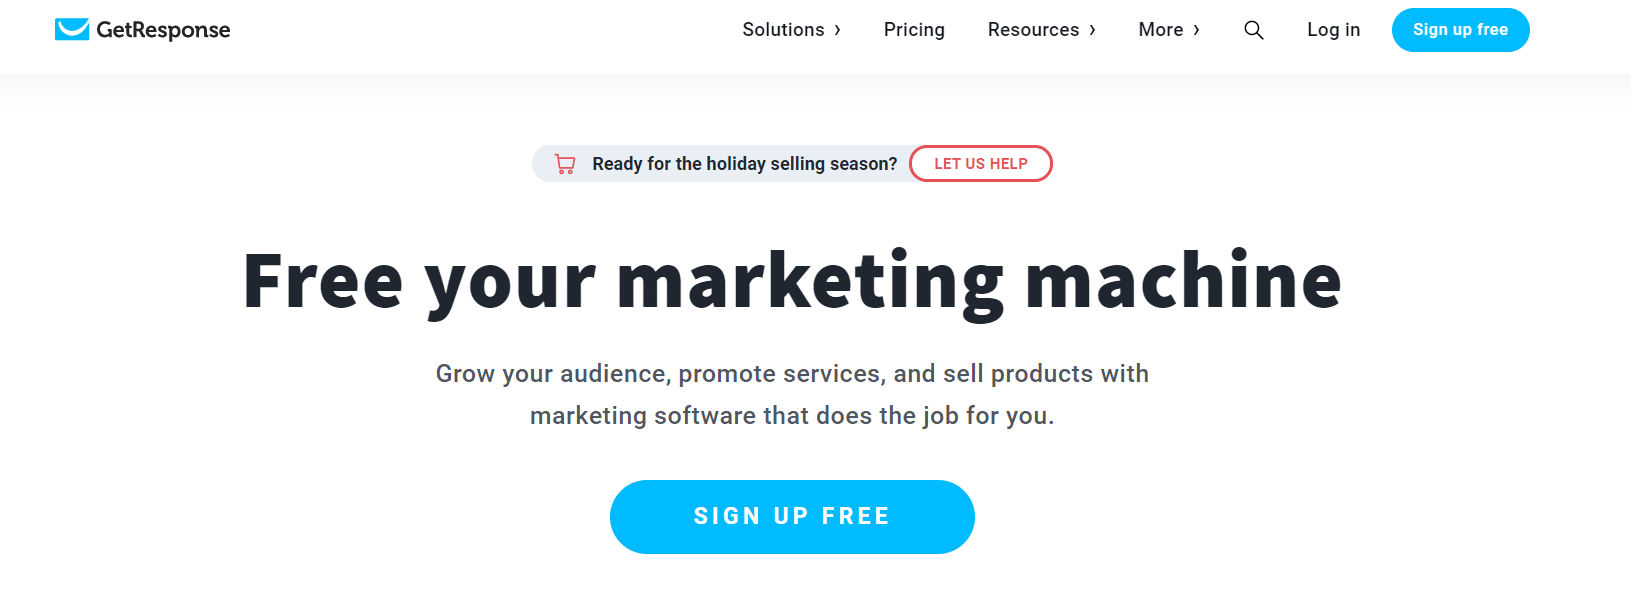 GetResponse email marketing tool